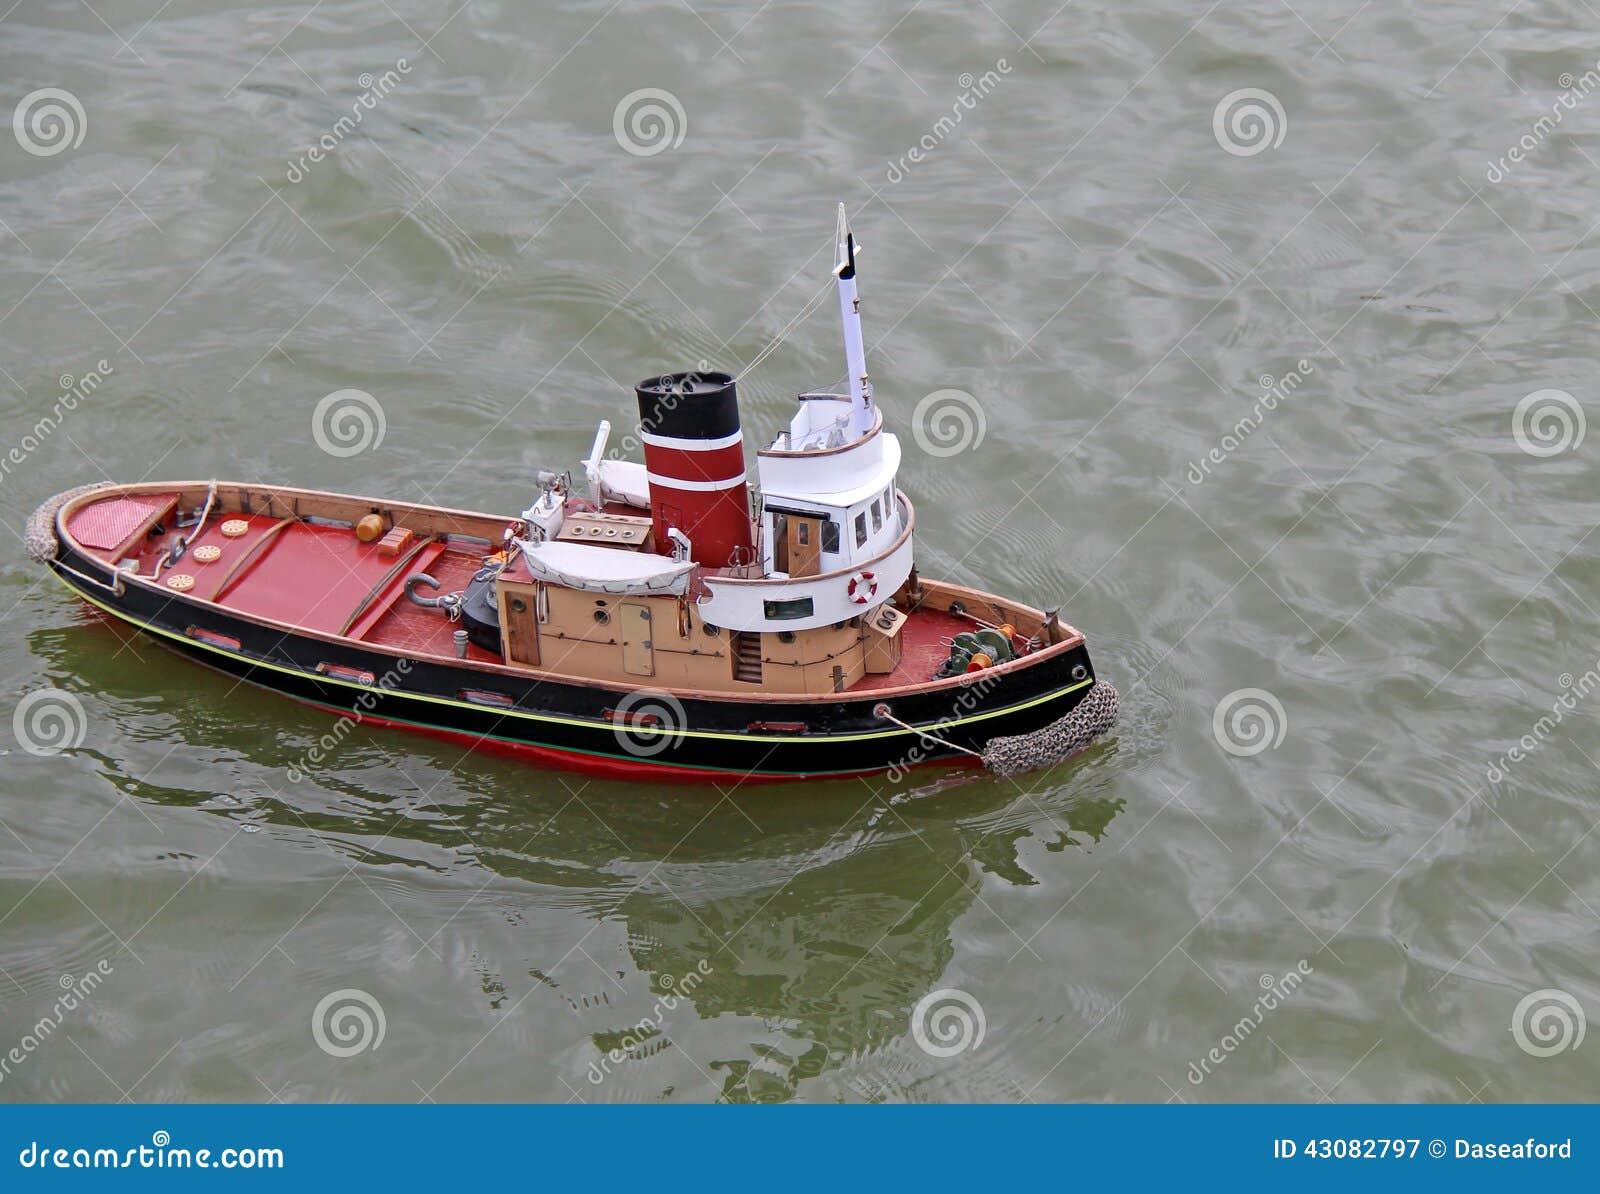 Radio controlled model yacht kits